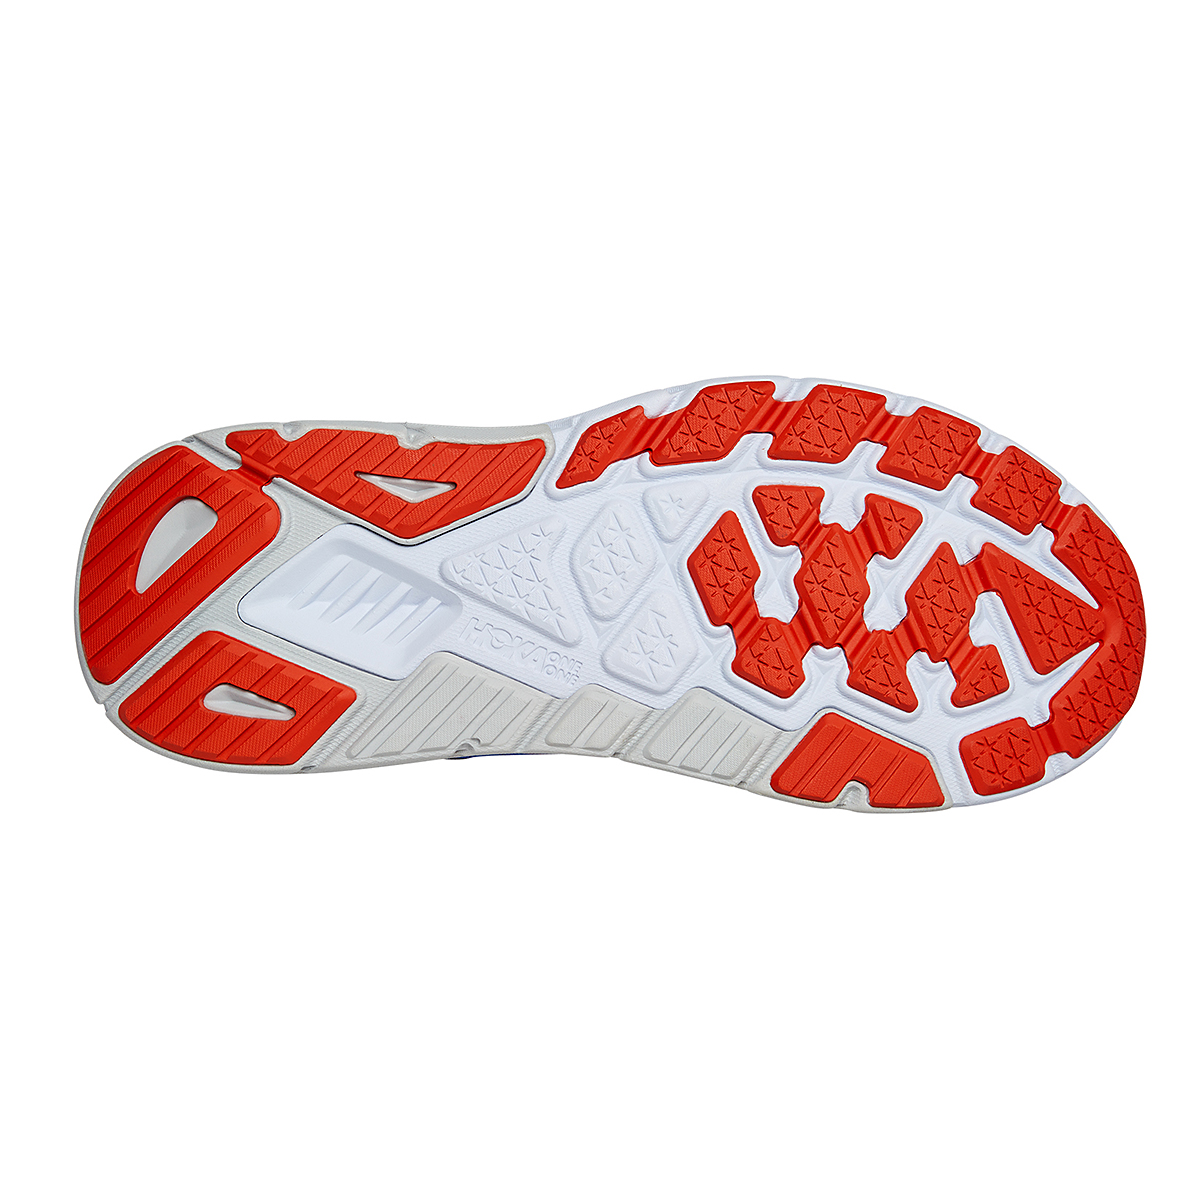 Men's Hoka One One Arahi 5 Running Shoe - Color: Turkish Sea/White - Size: 7 - Width: Regular, Turkish Sea/White, large, image 6